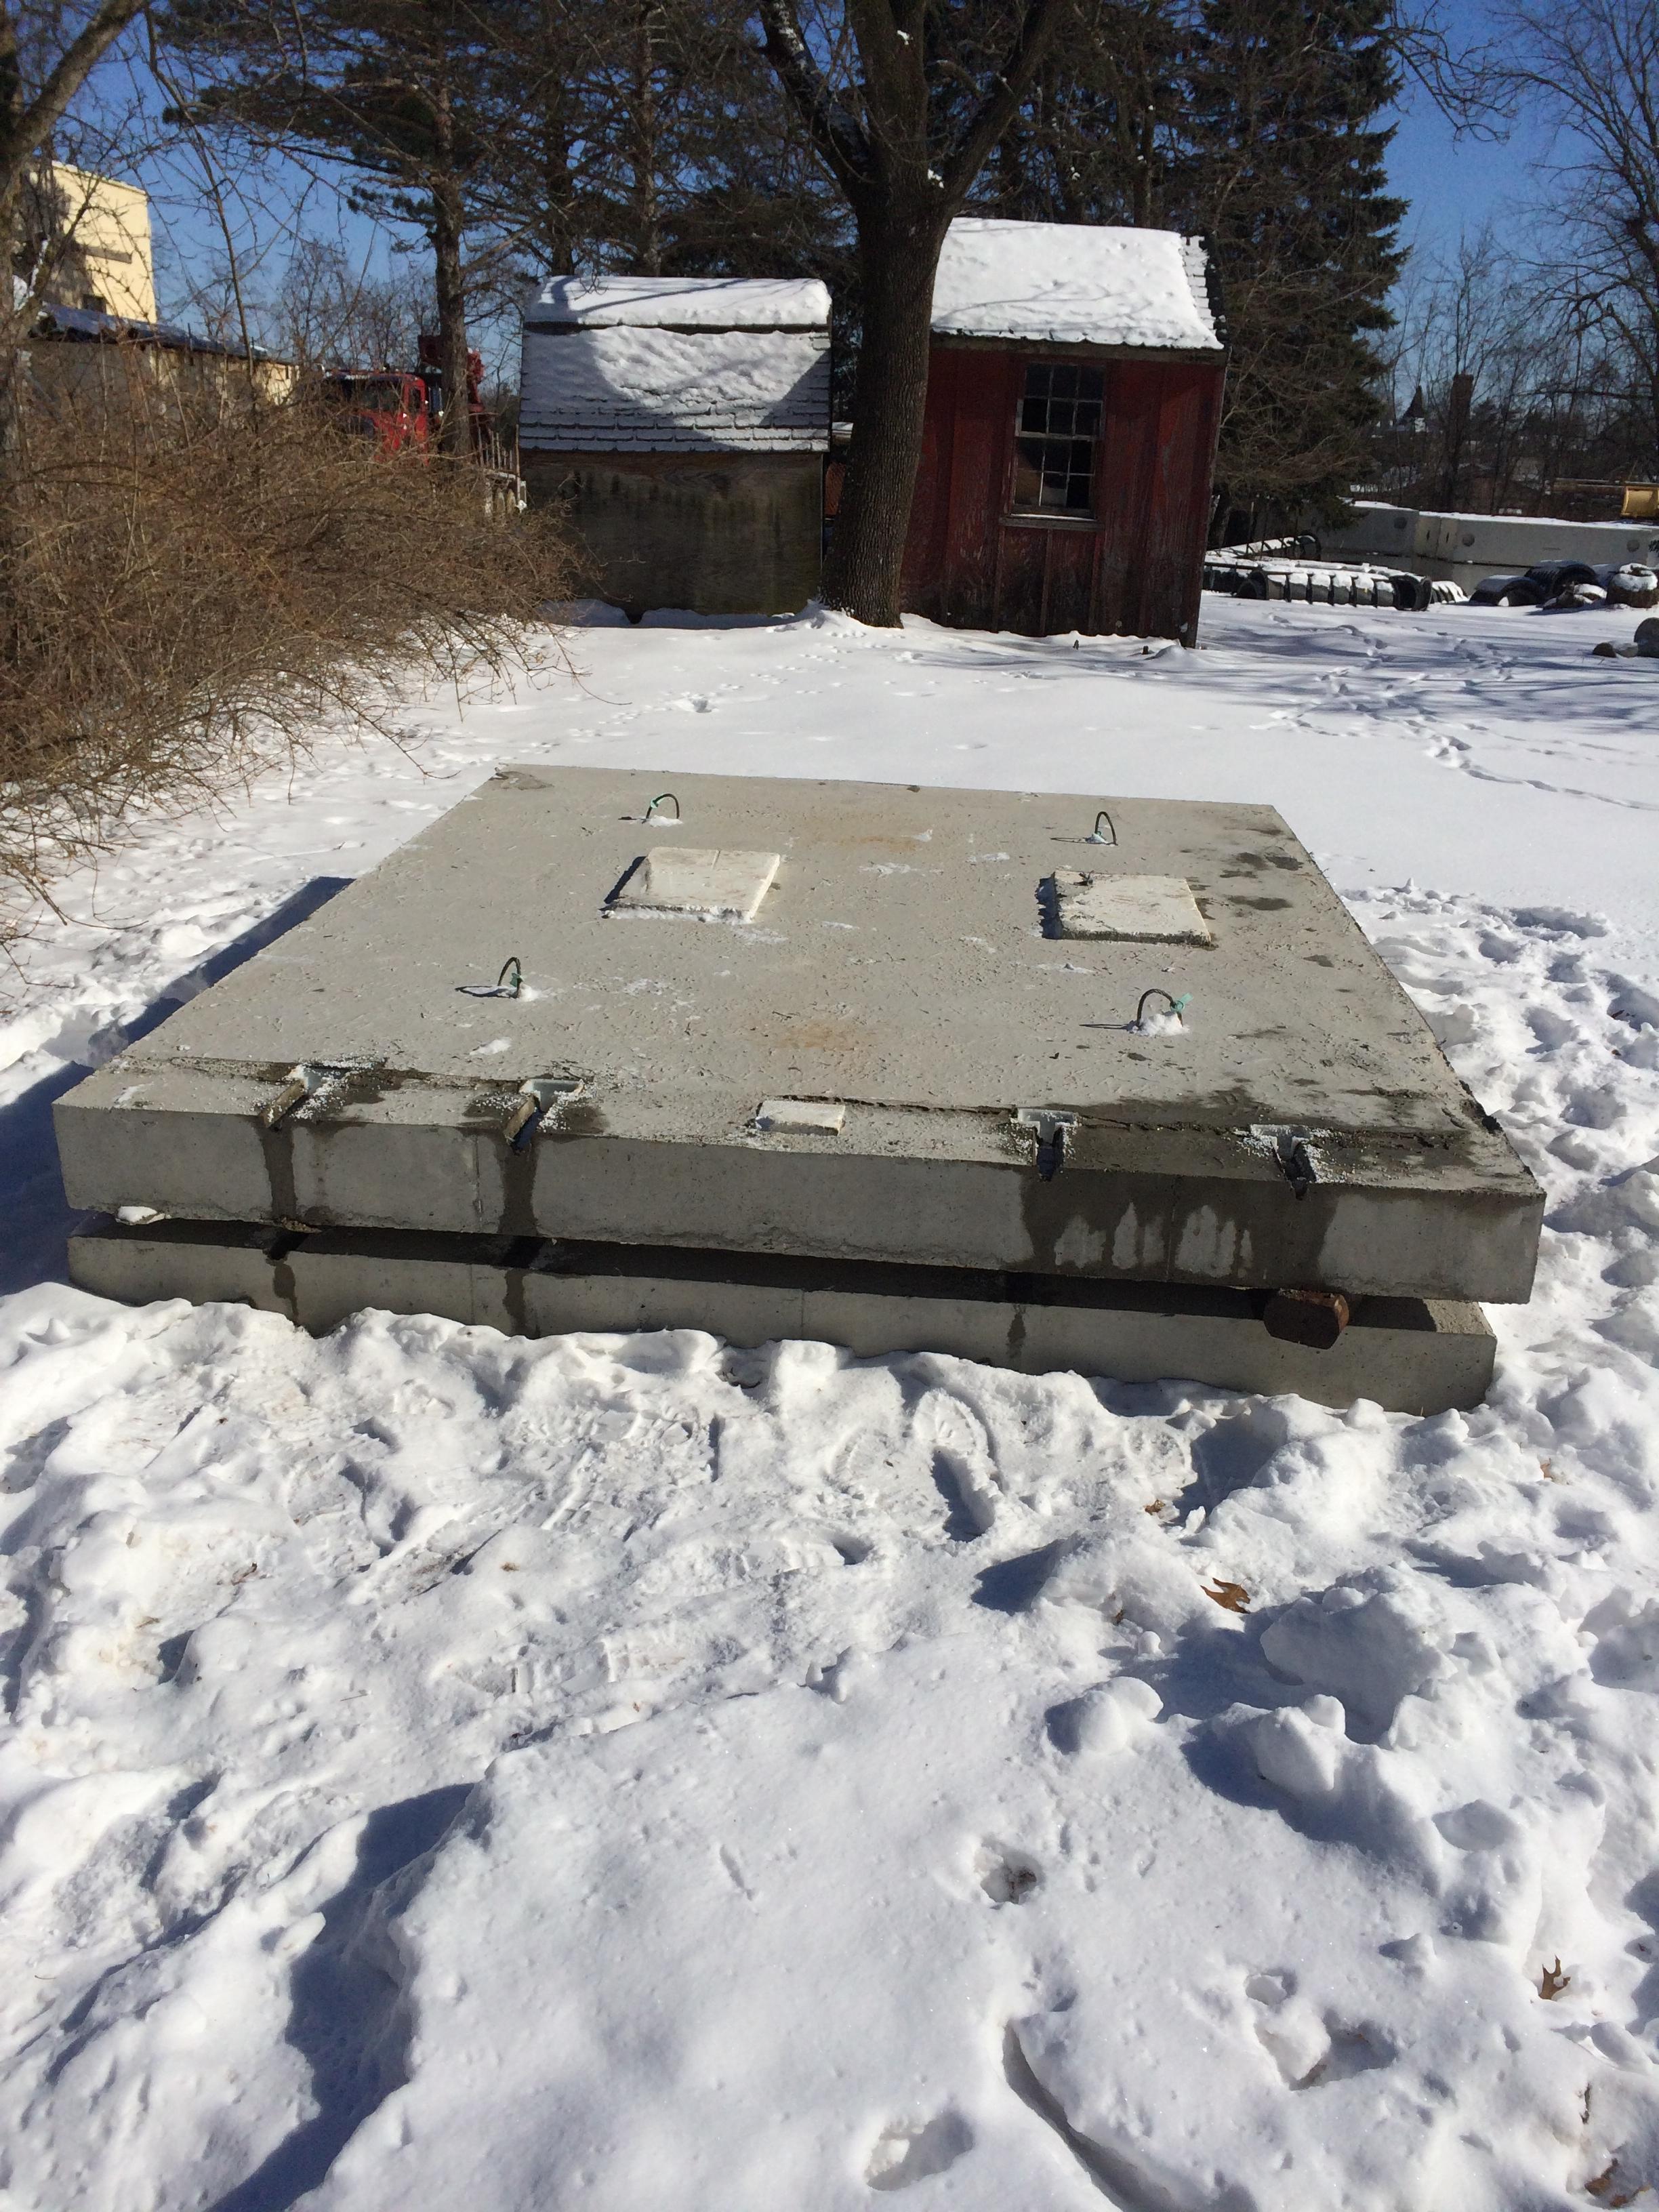 Transformer Pads